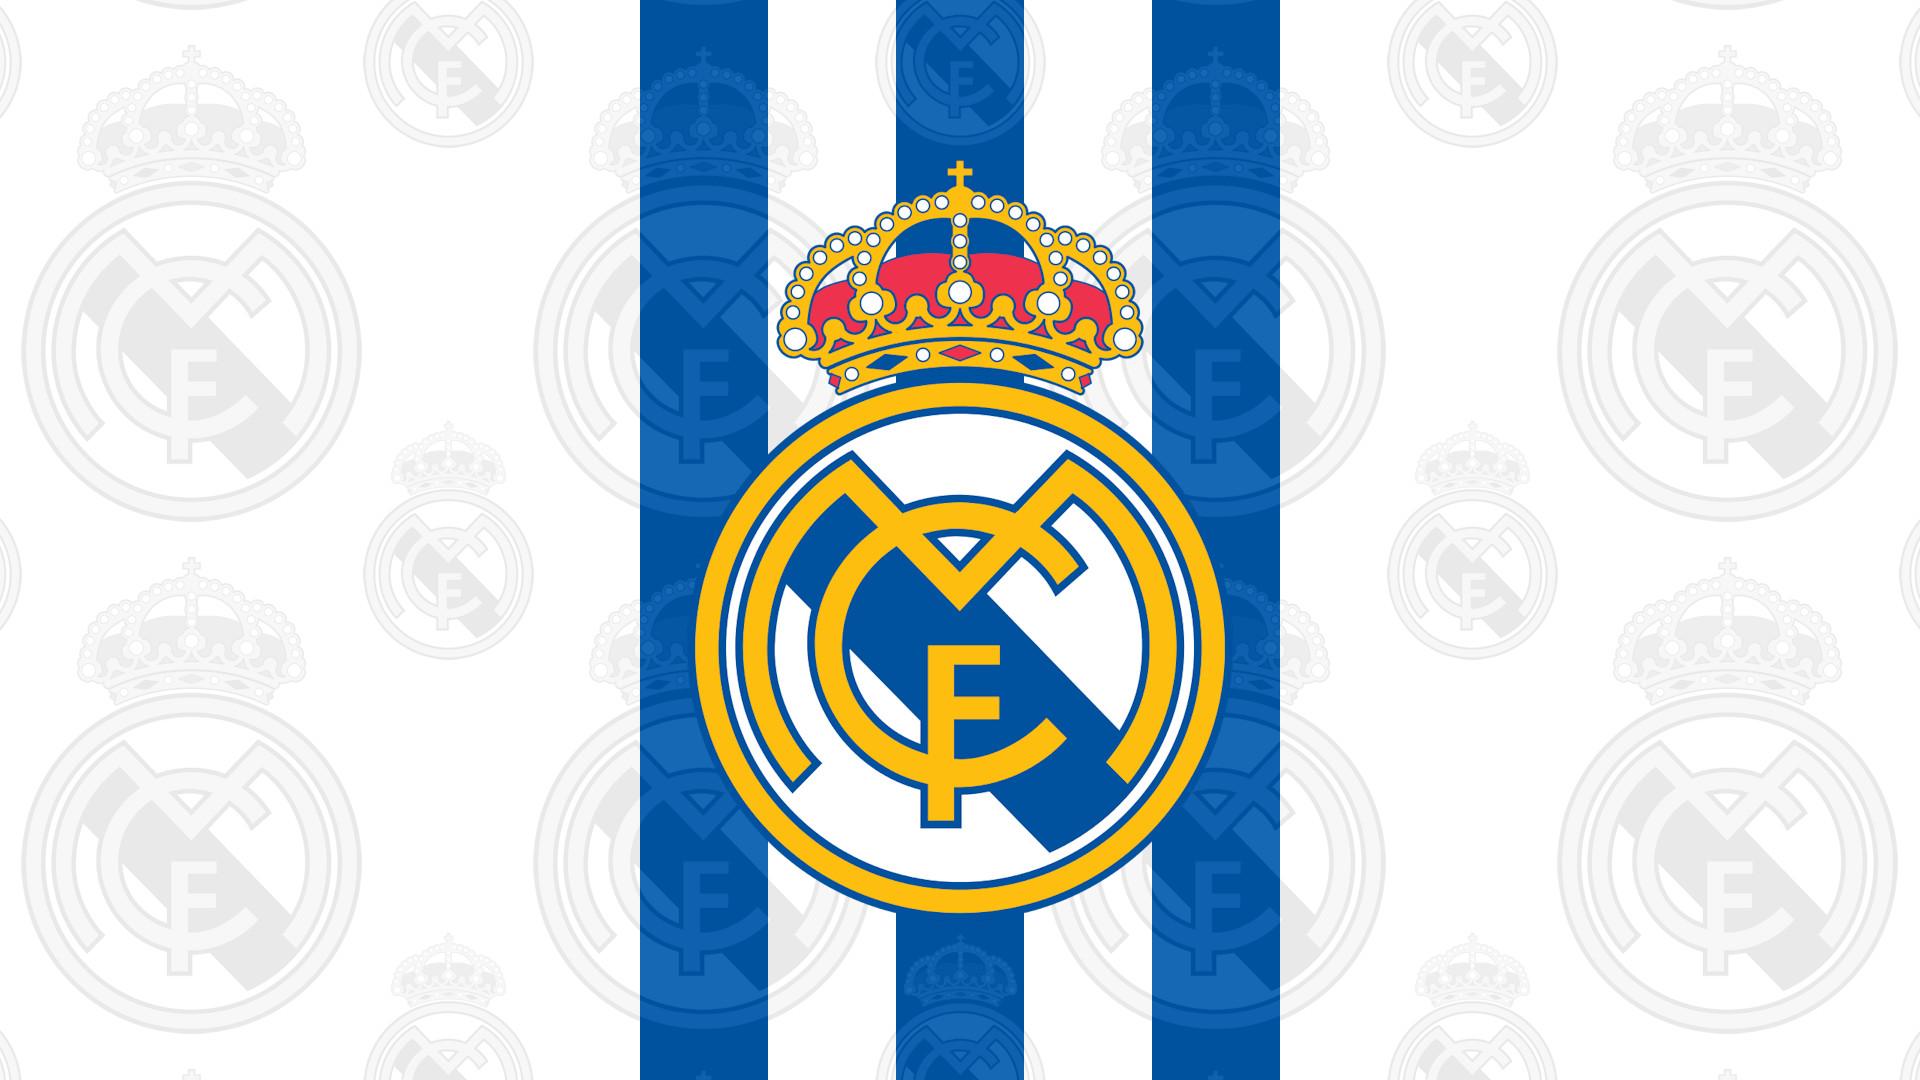 Download Wallpaper Real Madrid Bergerak Gallery | Images Wallpapers |  Pinterest | Real madrid and Wallpaper